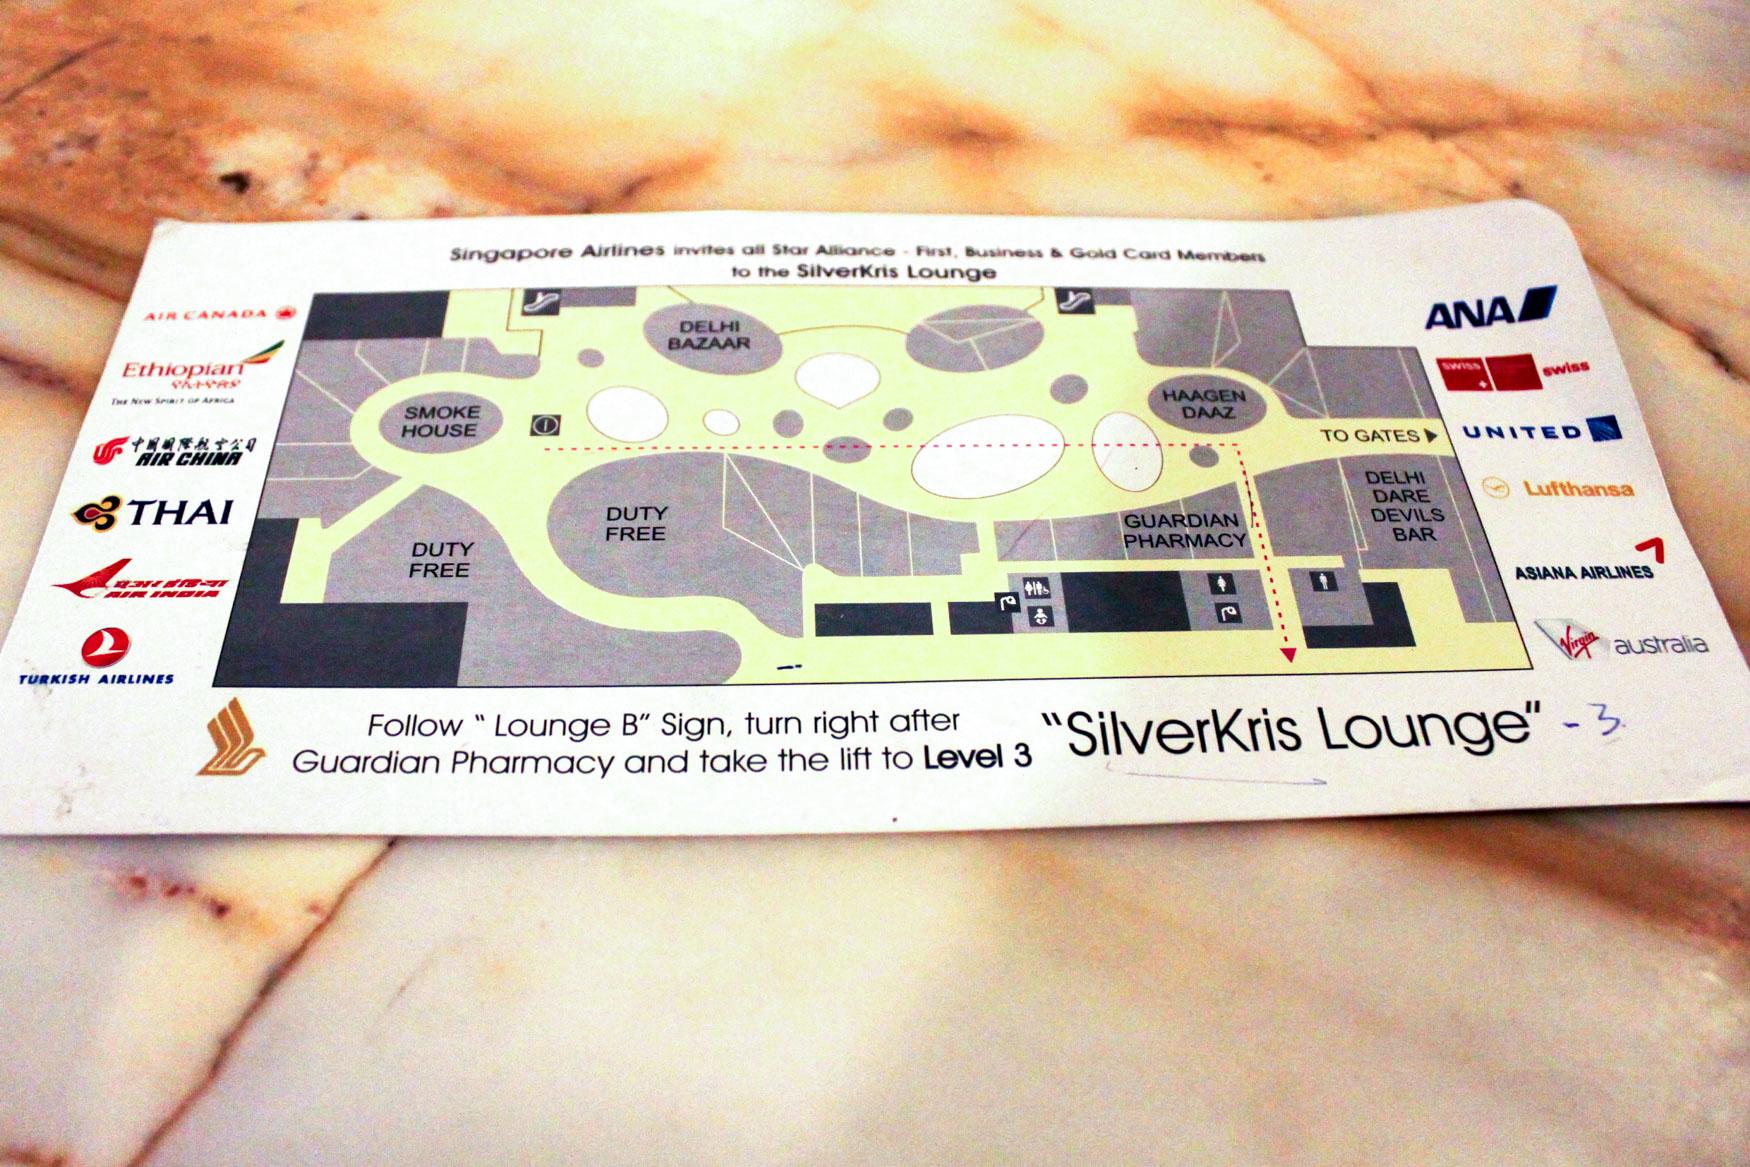 SilverKris Lounge Delhi Location